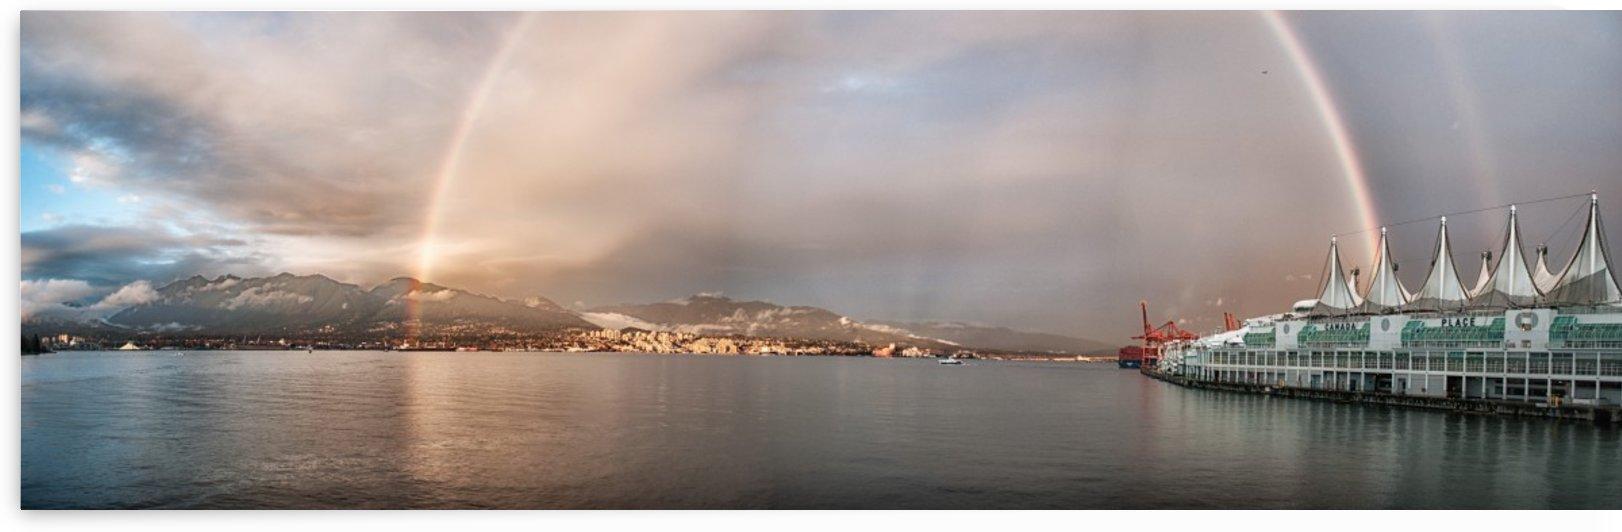 Rainbow by Andrea Spallanzani